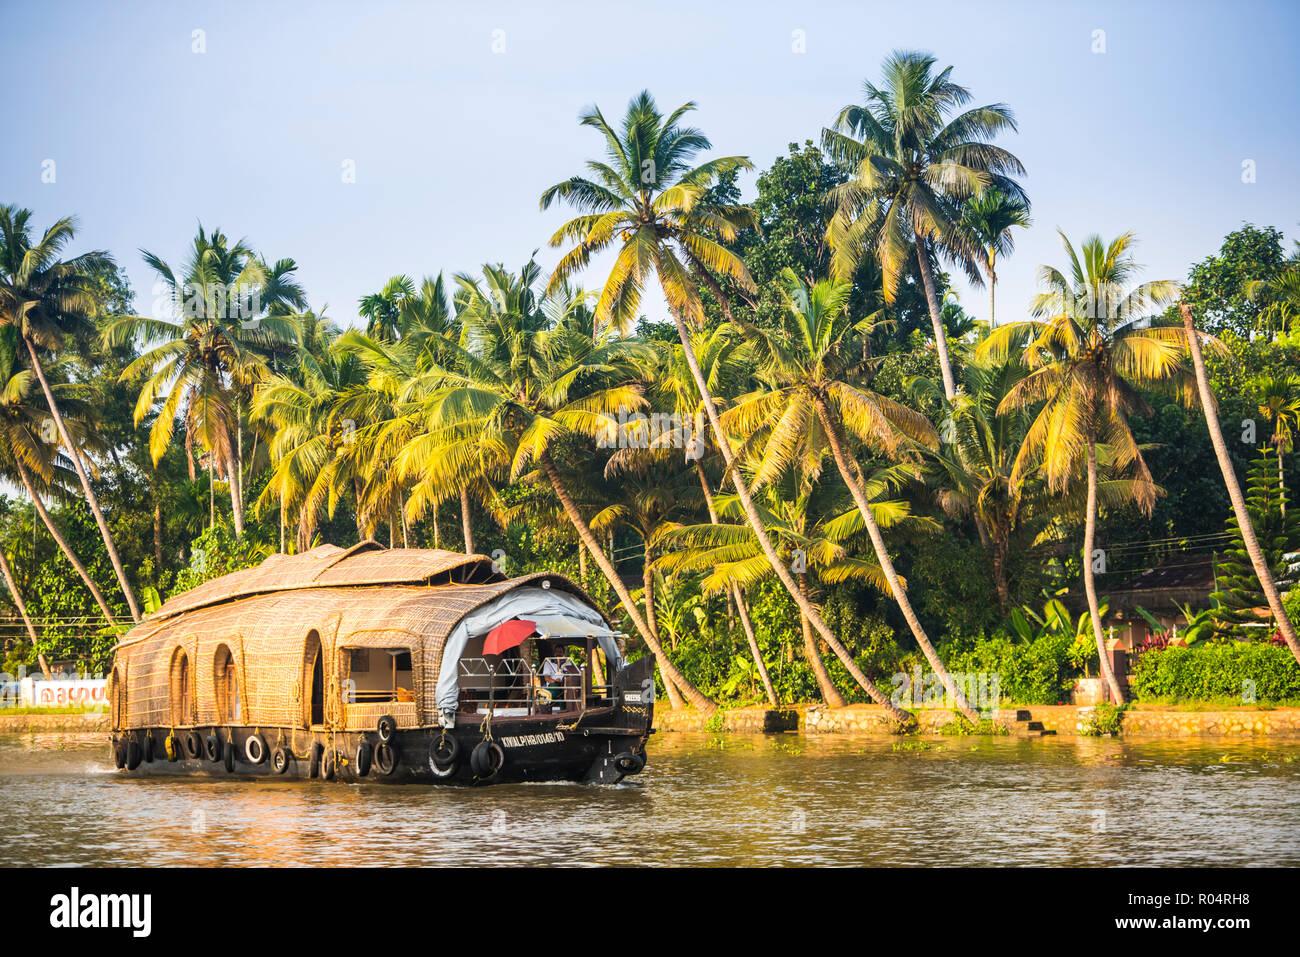 Houseboat nelle backwaters vicino a Cochin (Alappuzha), Kerala, India, Asia Immagini Stock